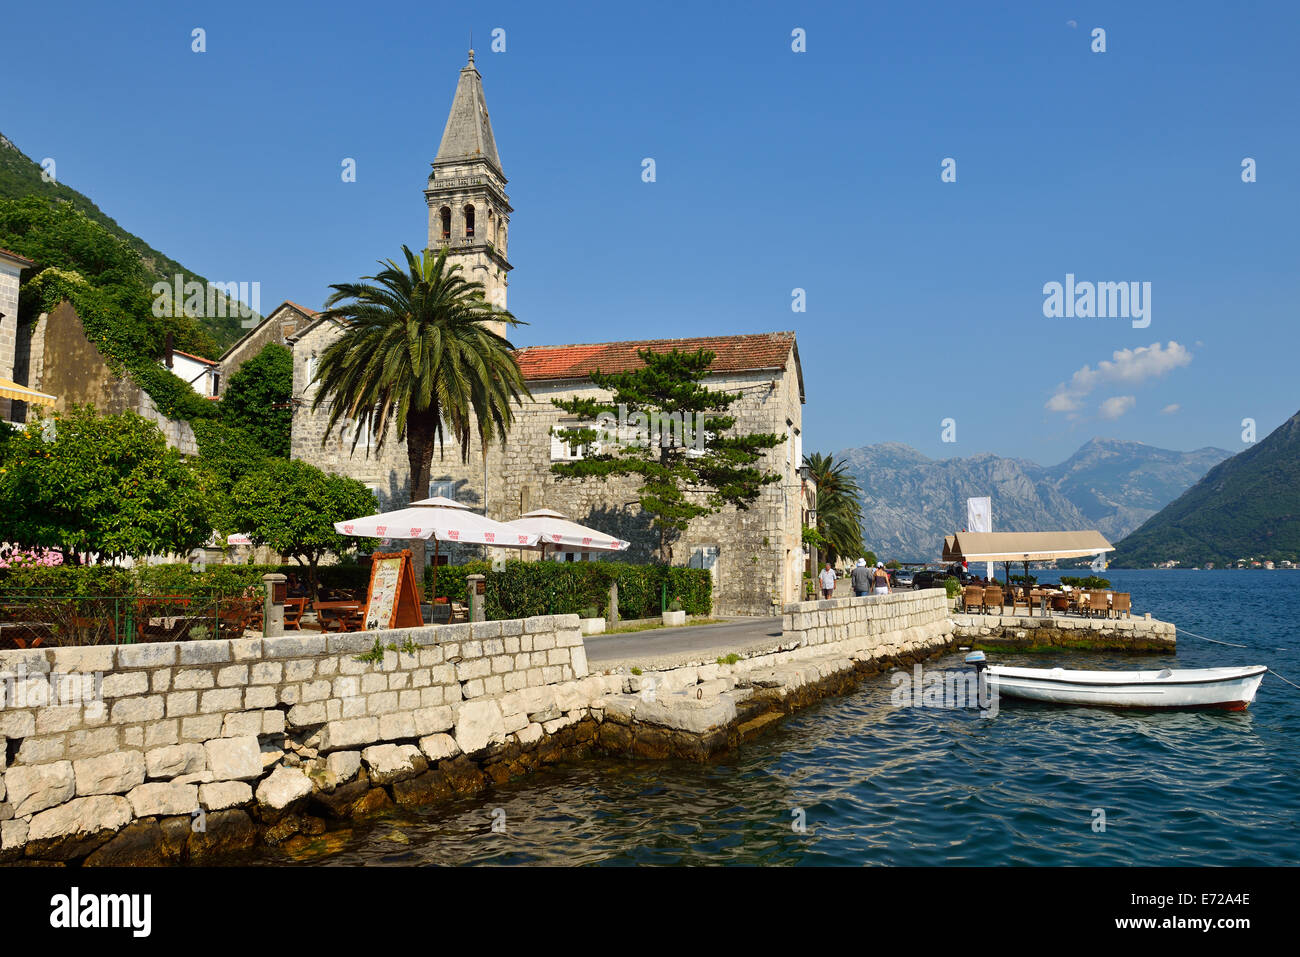 Perast harbour, Bay of Kotor, Montenegro, The Balkans - Stock Image